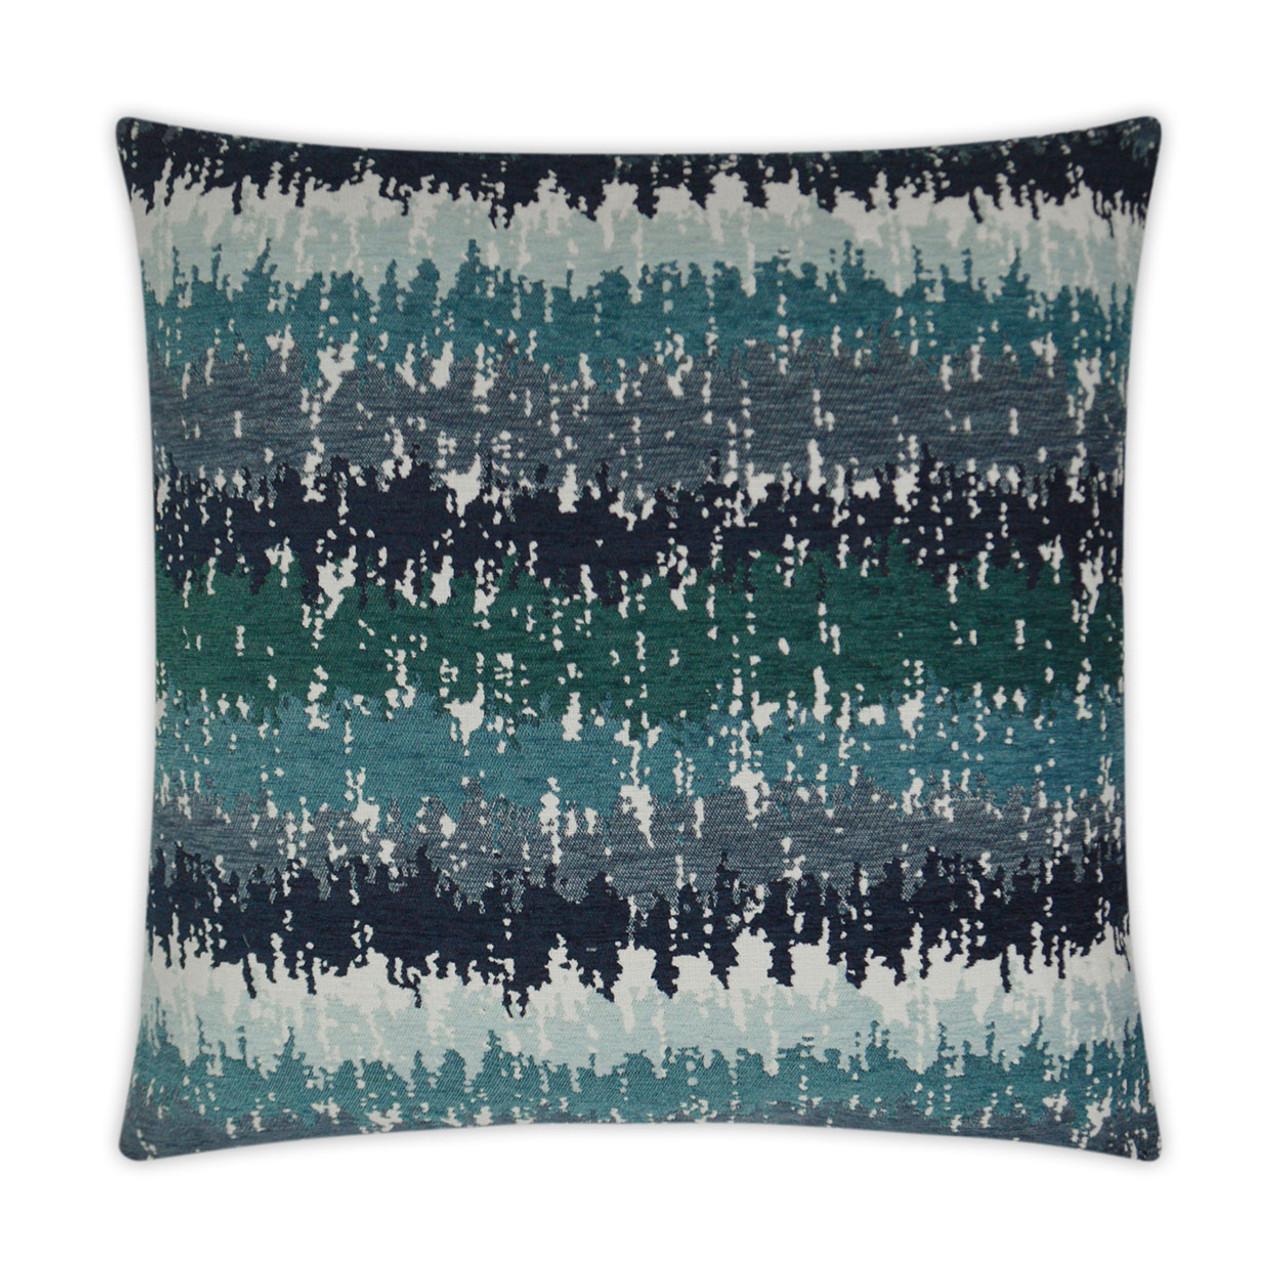 Aurora Waterfall Pillow